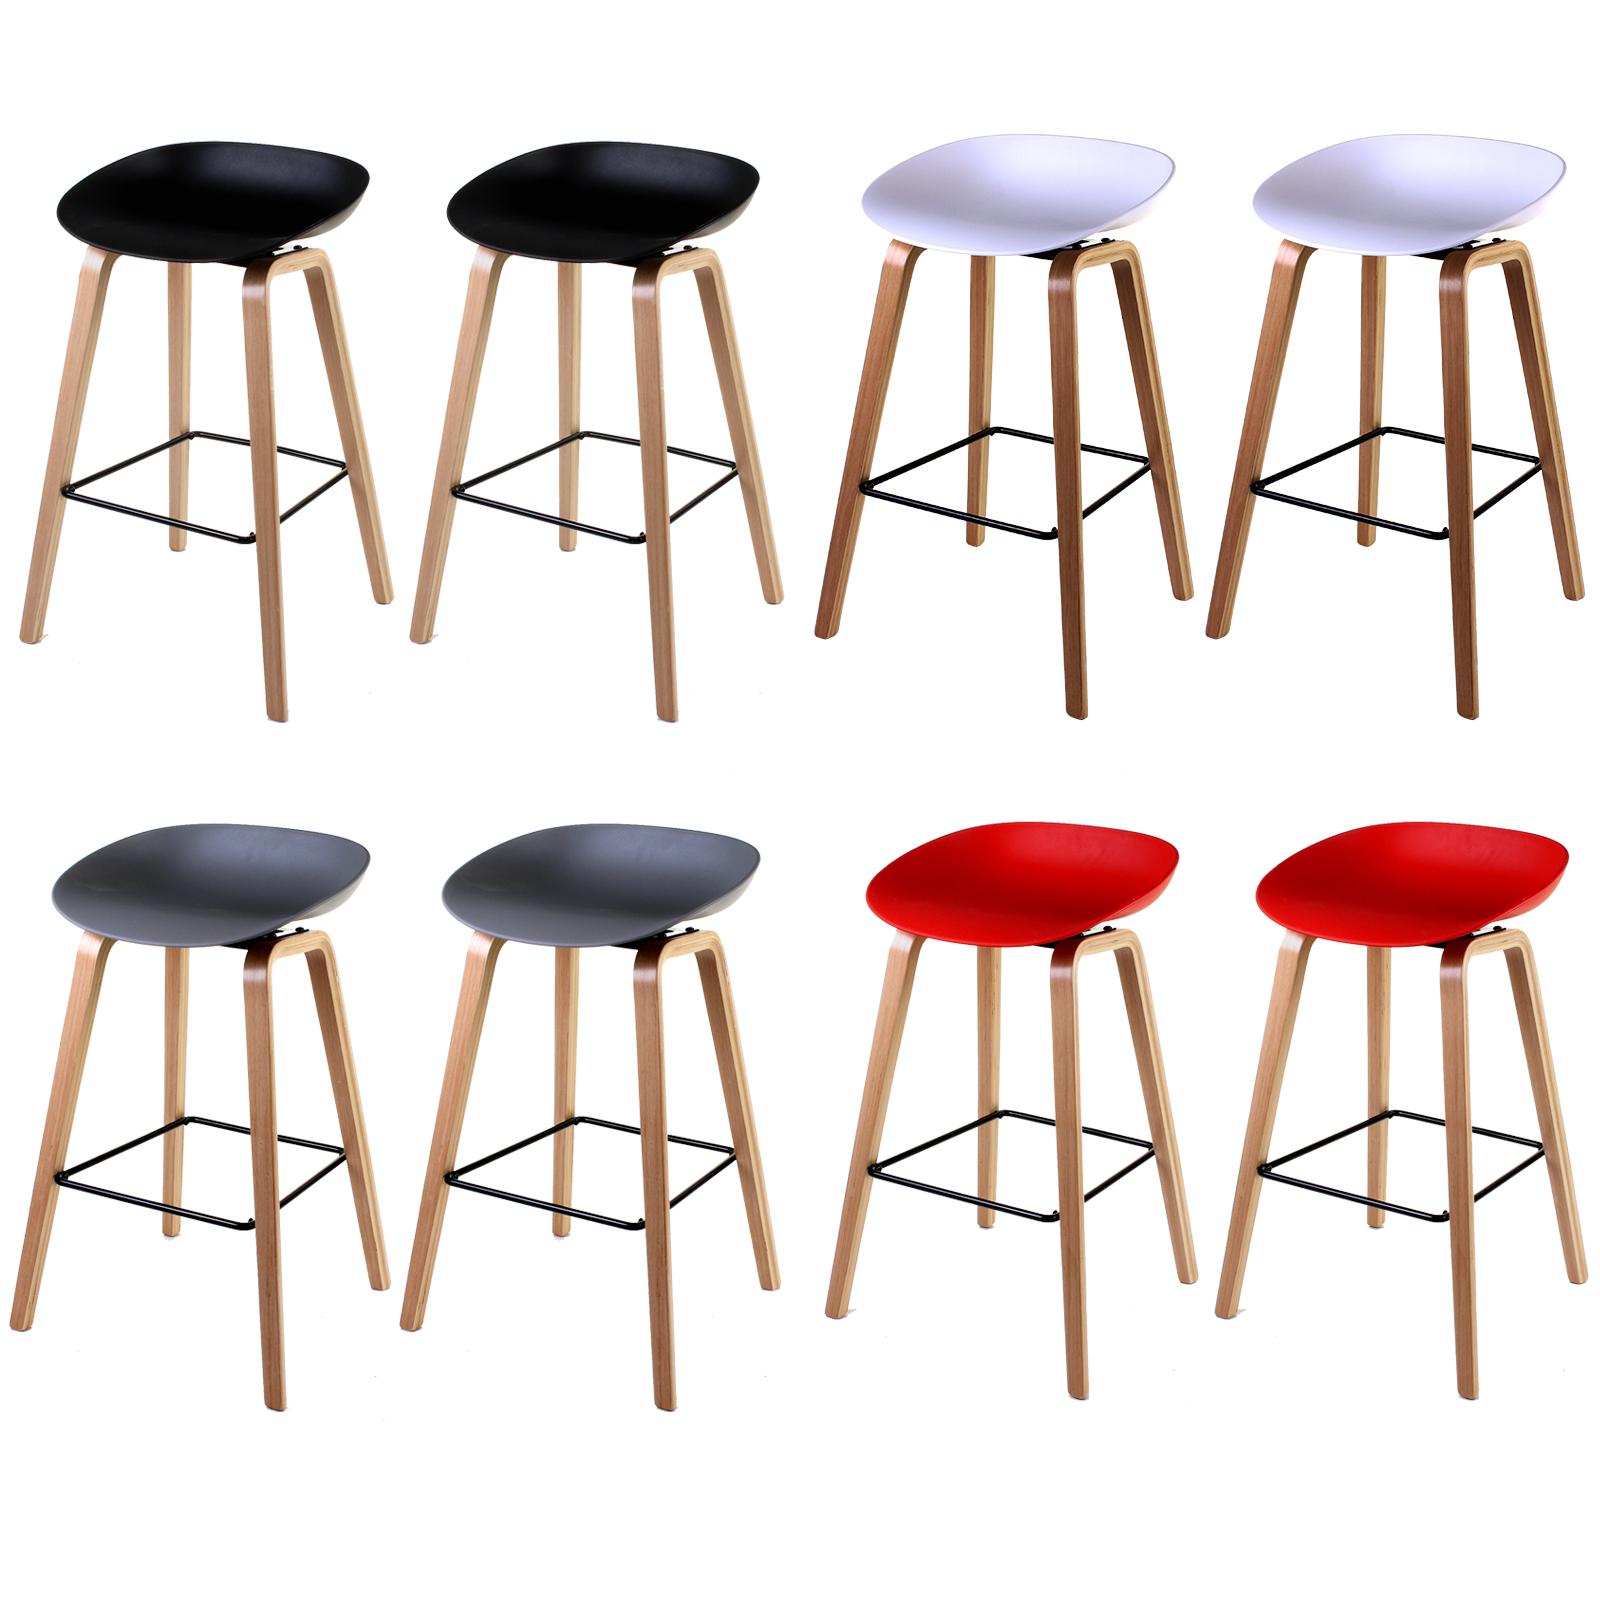 Home, Furniture & DIY Set of 9 Bar Stools Kitchen Breakfast Chair ...